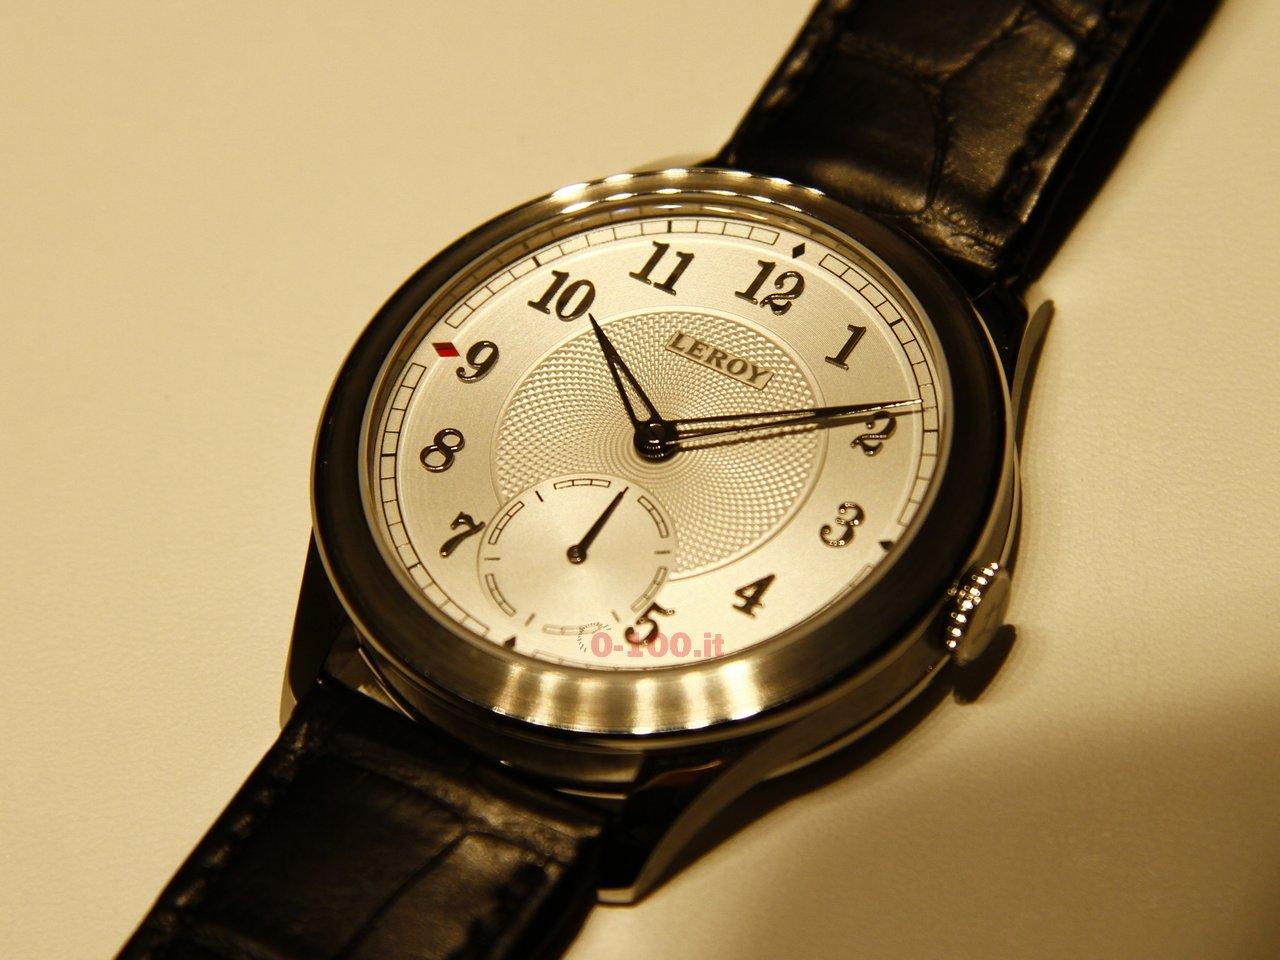 baselworld-2015_leroy-chronometer-l200-0-100-7